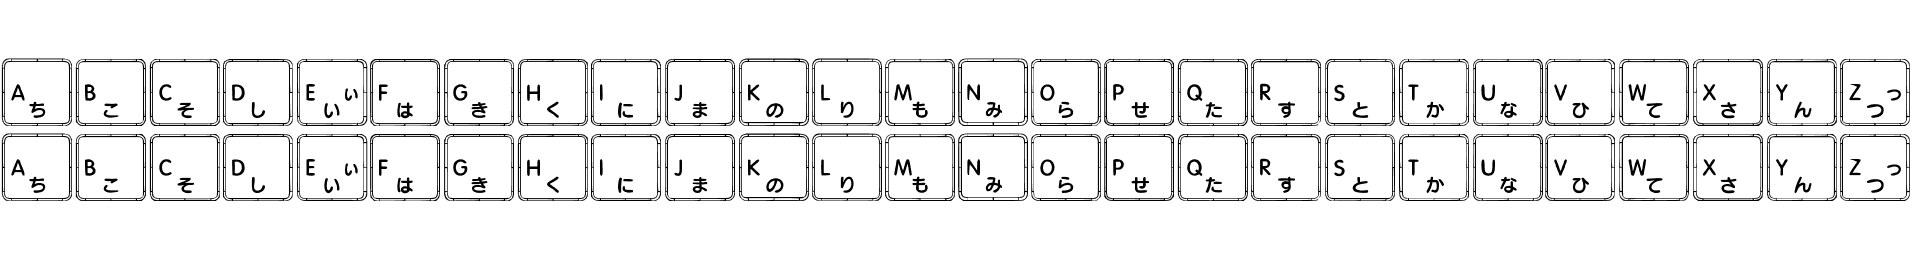 Apple Japanese Keyboard